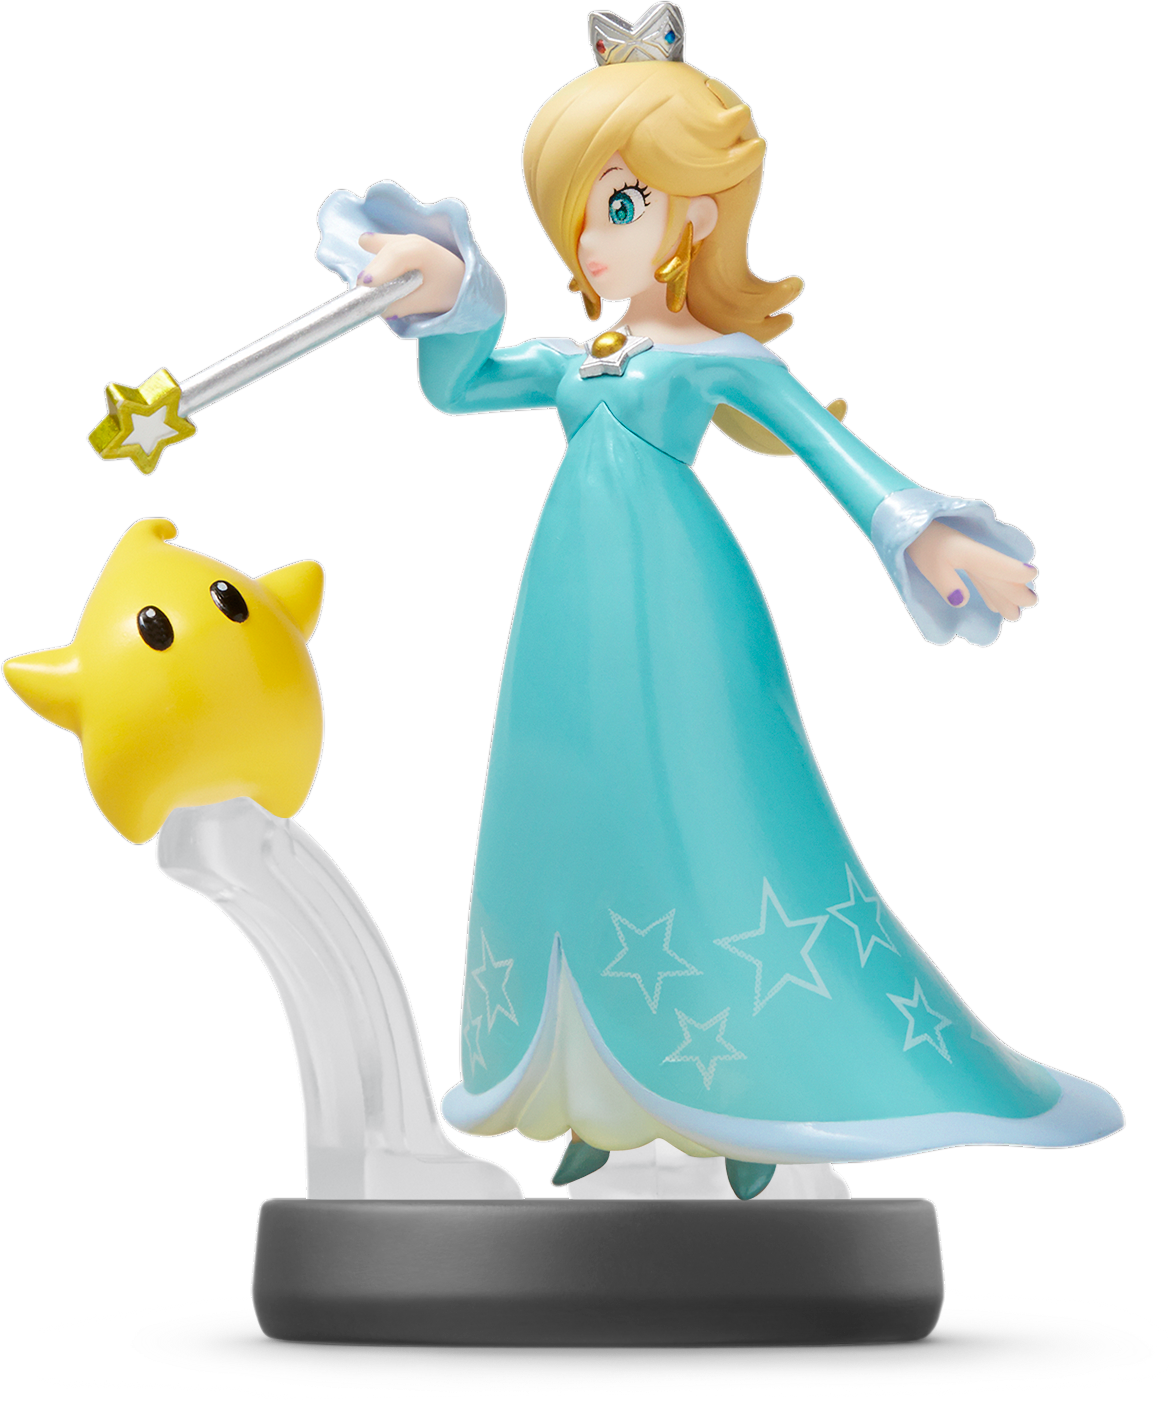 Rosalina (Super Smash Bros )   Amiibo Wiki   FANDOM powered